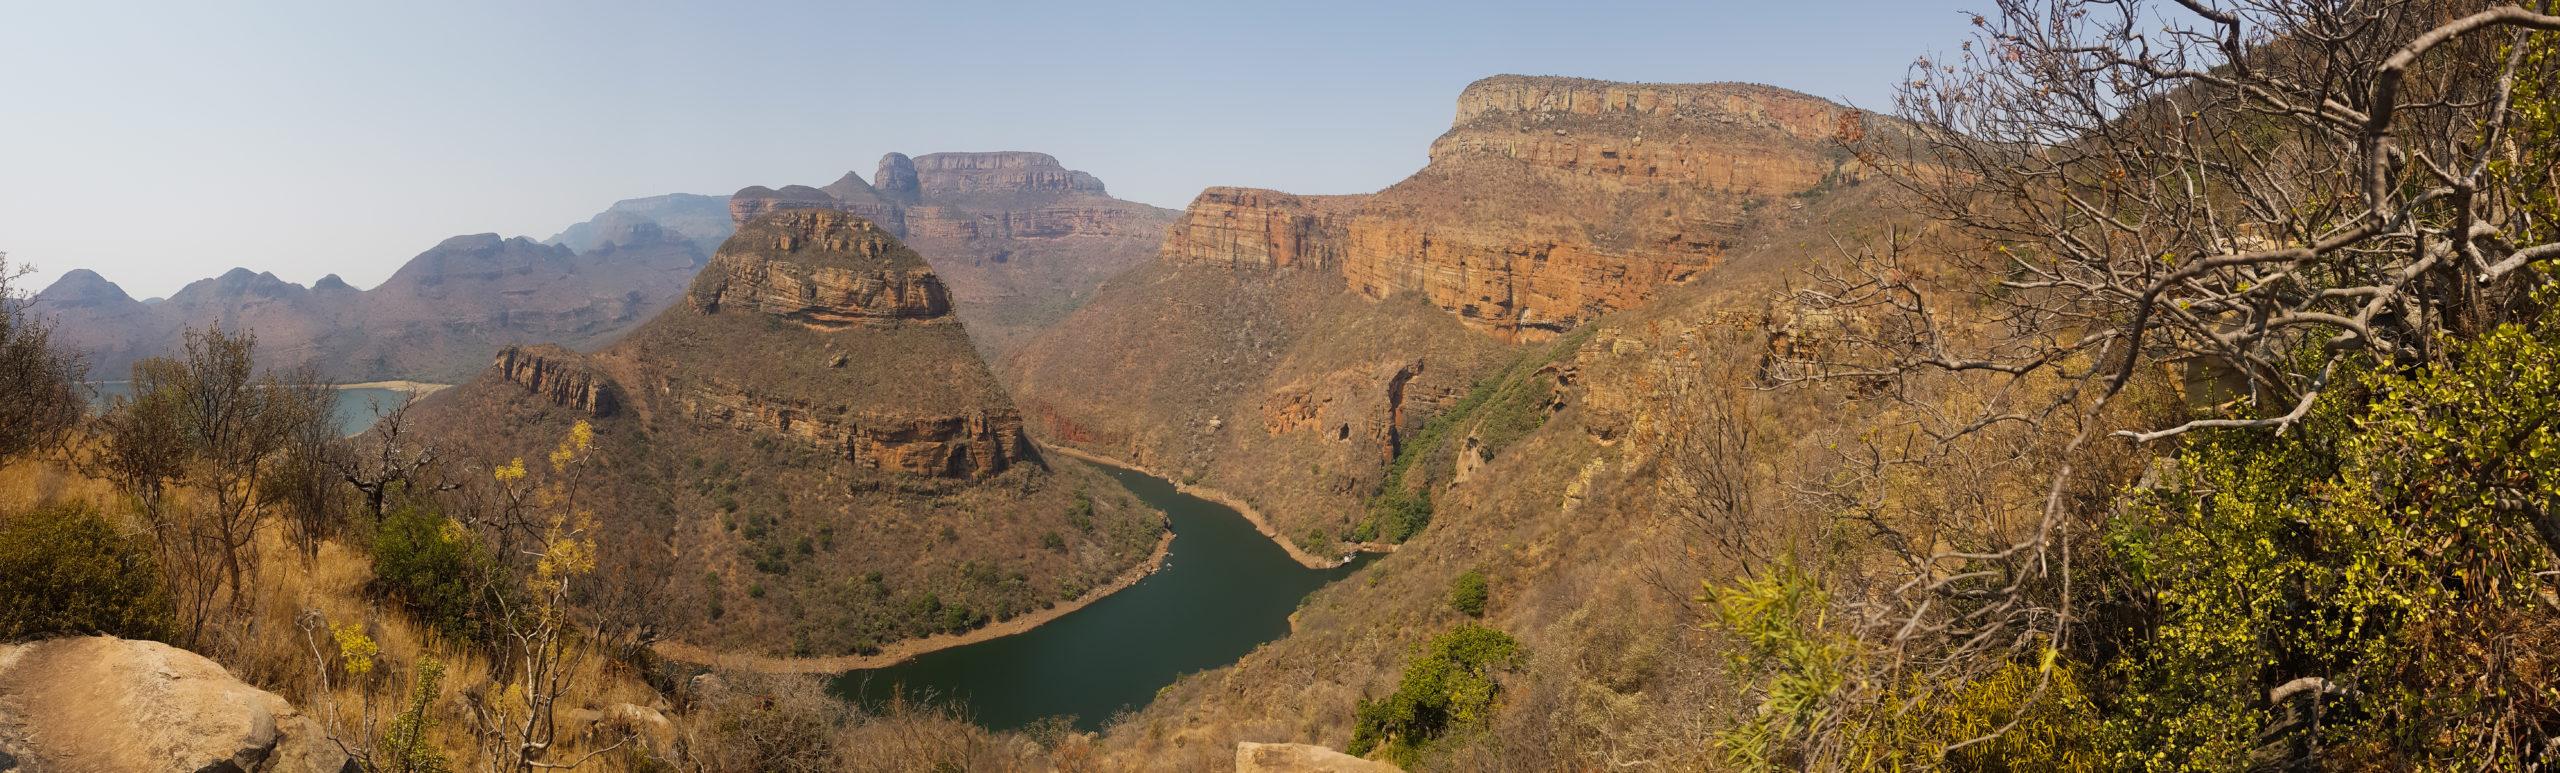 Blick auf den Fluss im Blyde Canyon